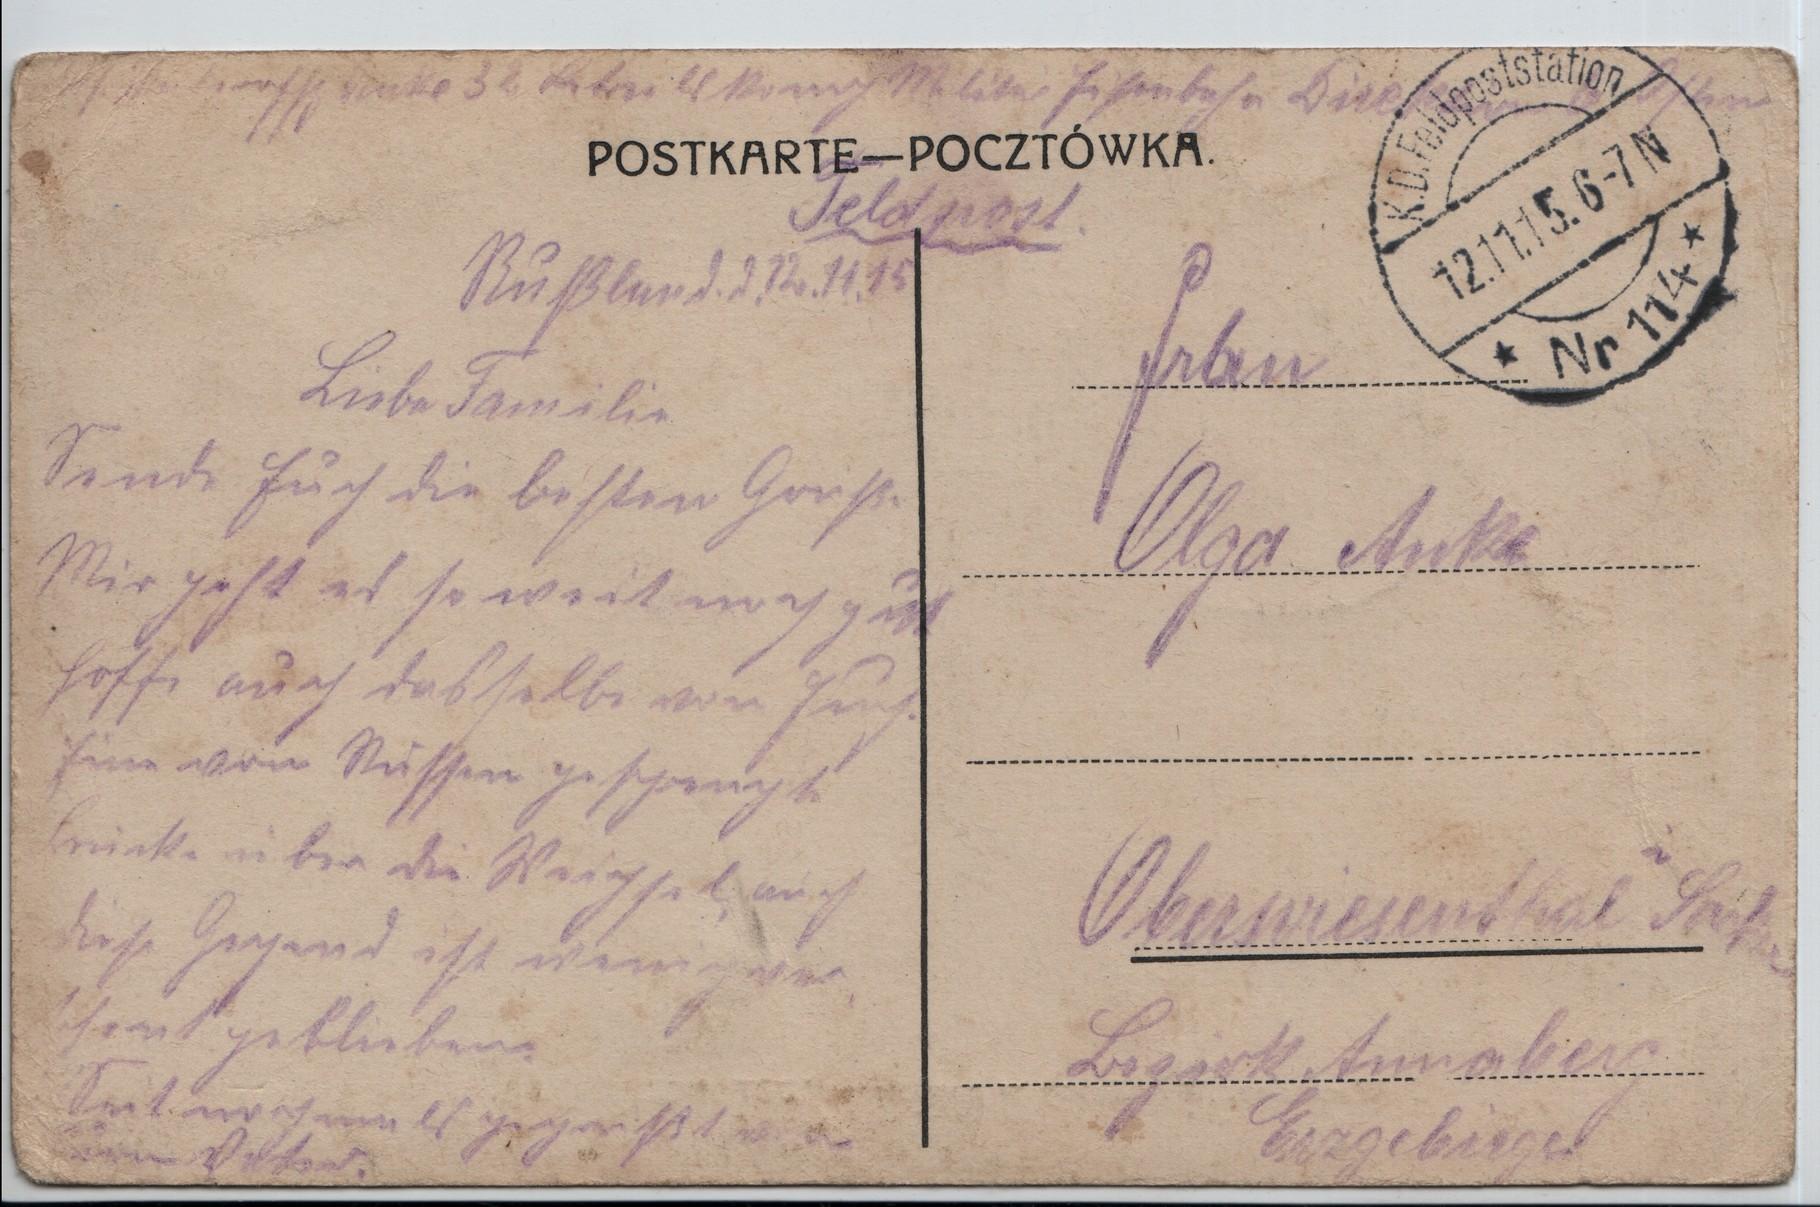 3. 12 Nov 1915